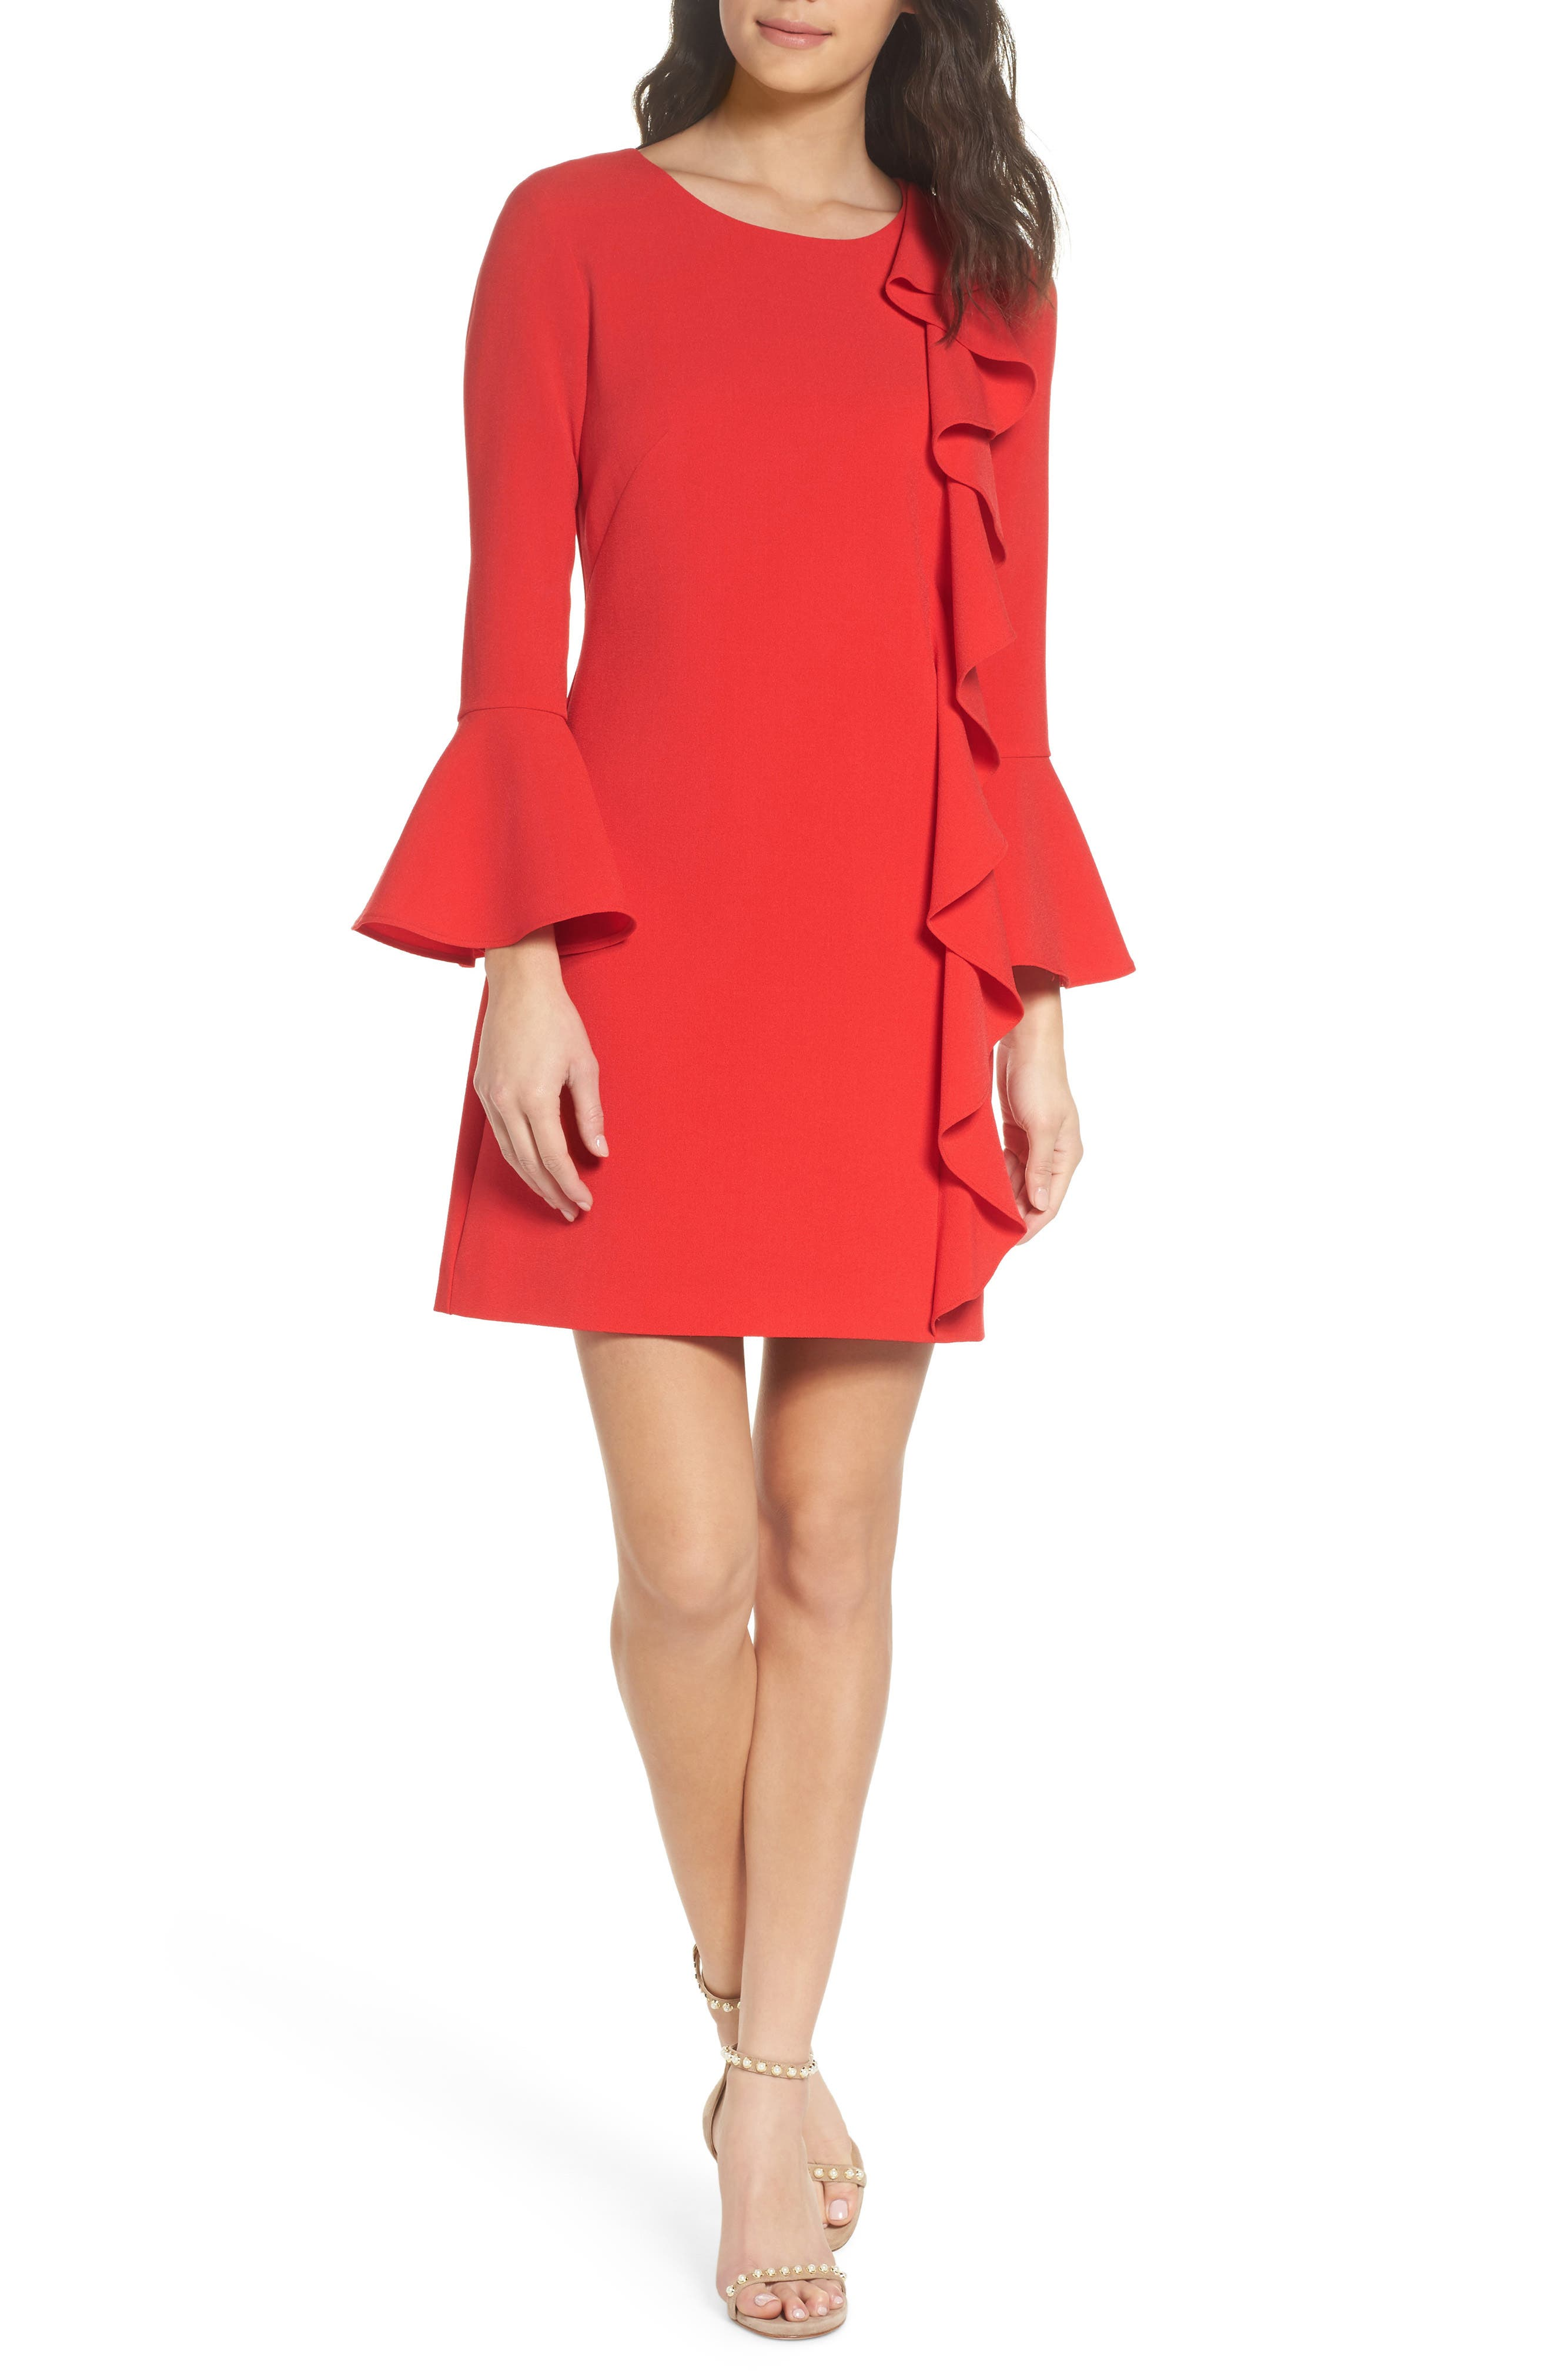 Alternate Image 1 Selected - Chelsea28 Ruffle Shift Dress